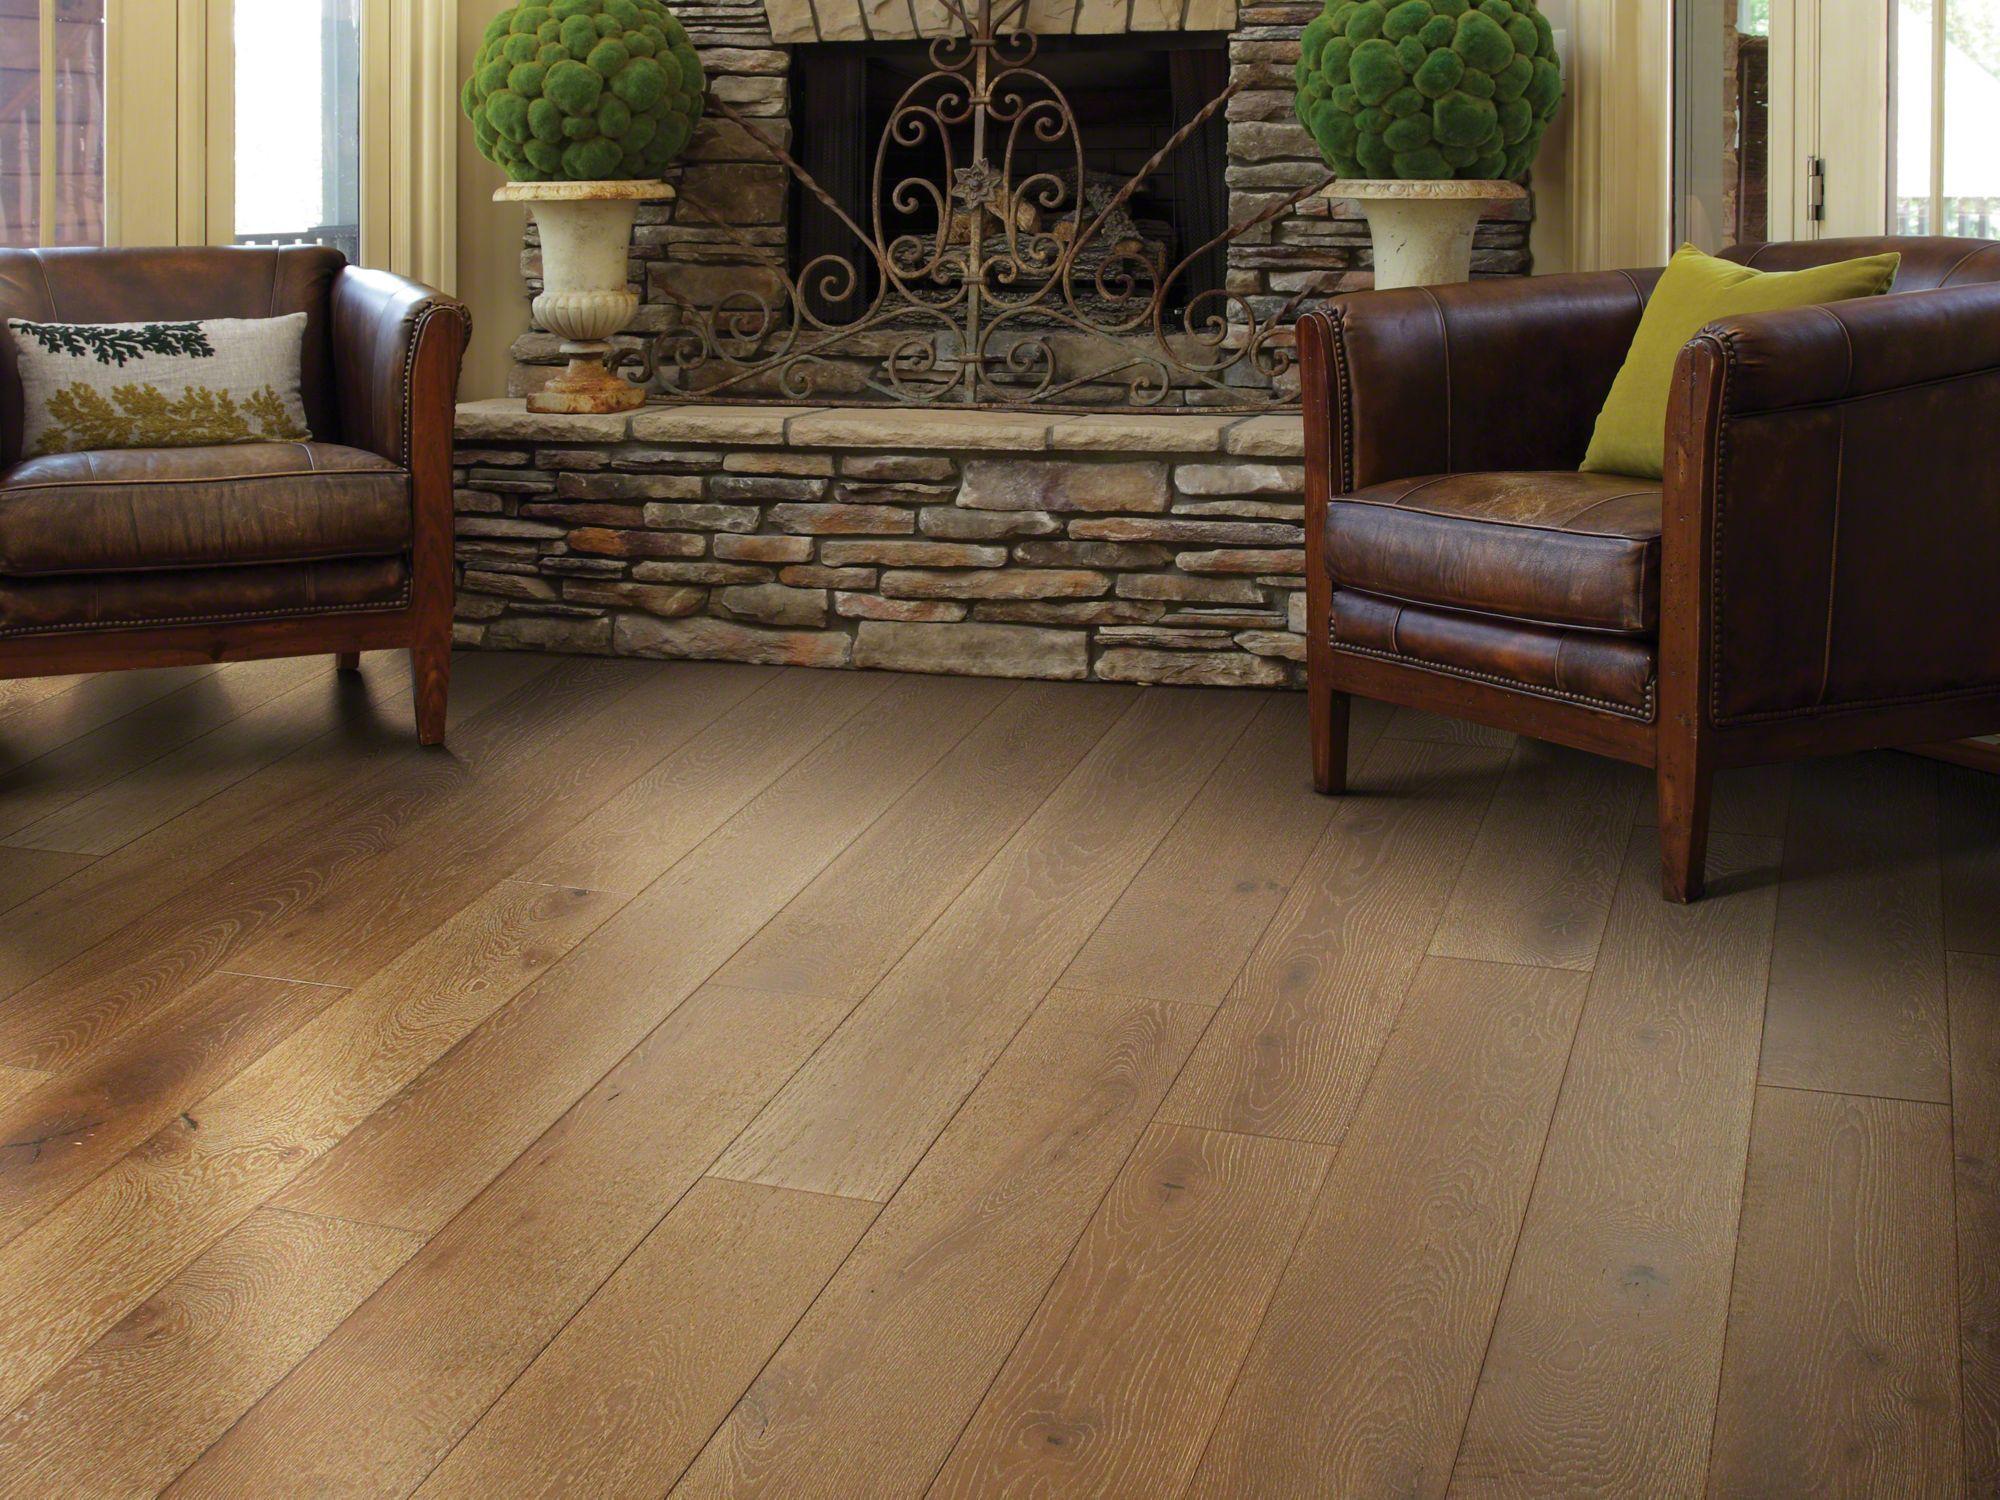 Hardwood Flooring Flooring How Toswid 1020 Katy Amp Rich